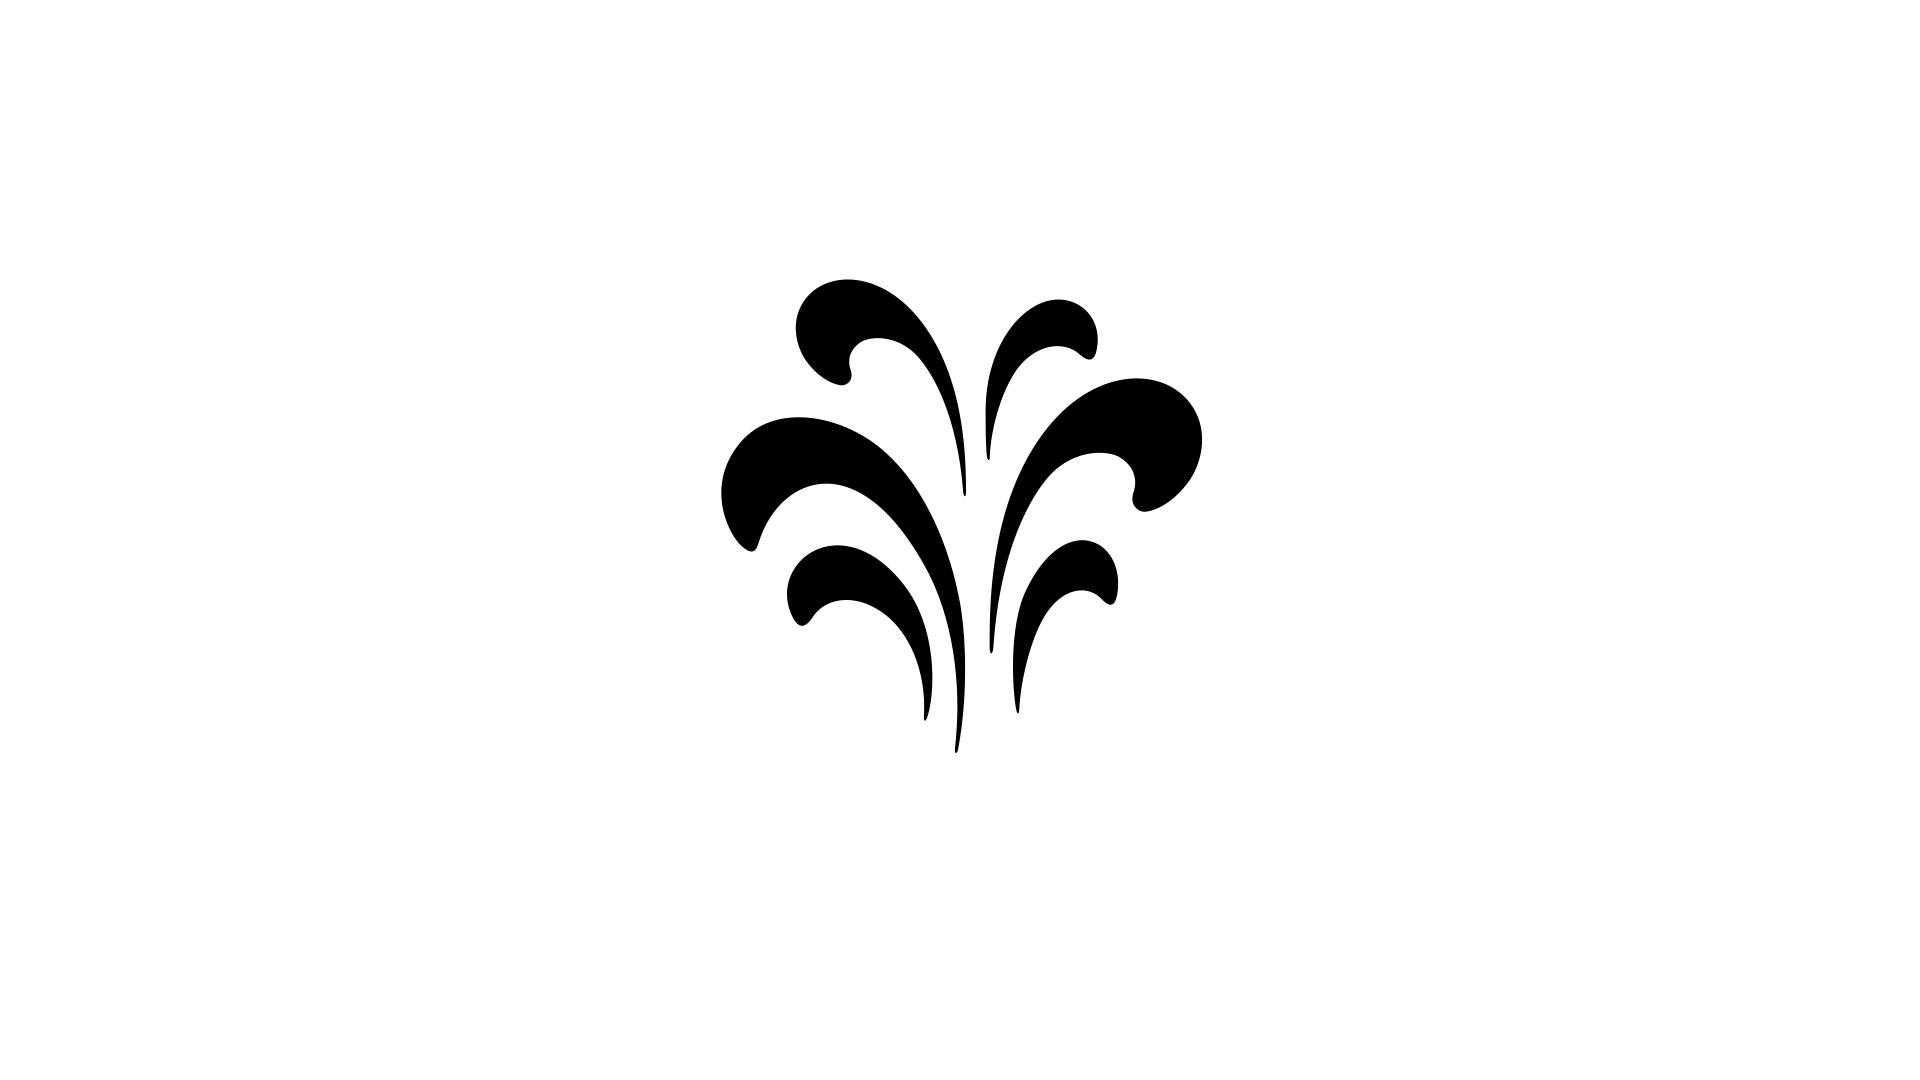 Symbols logotypes thomas manss company la 21 symbol biocorpaavc Images